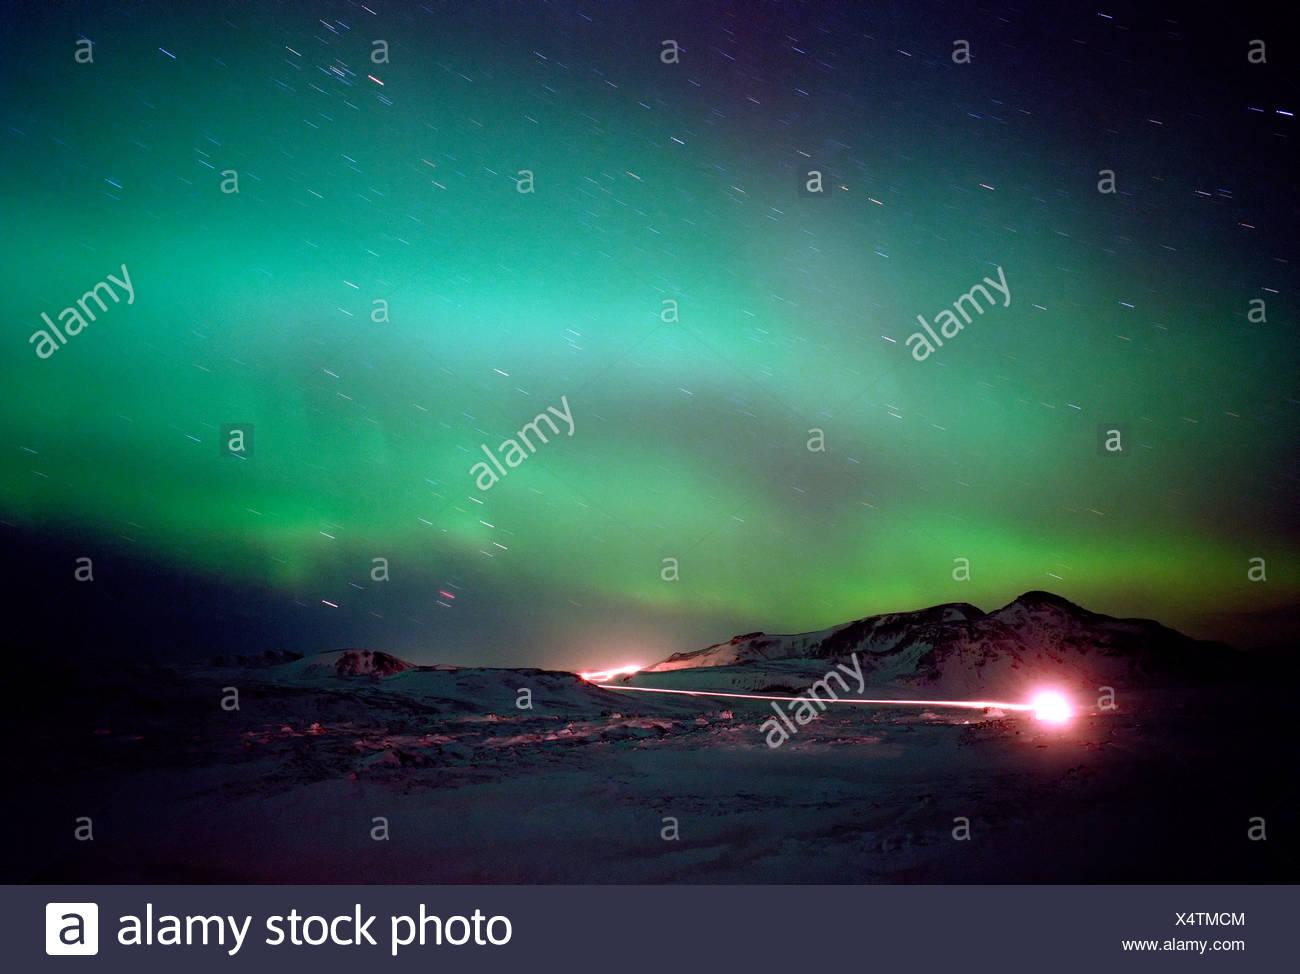 Aurora Borealis, Iceland - Stock Image